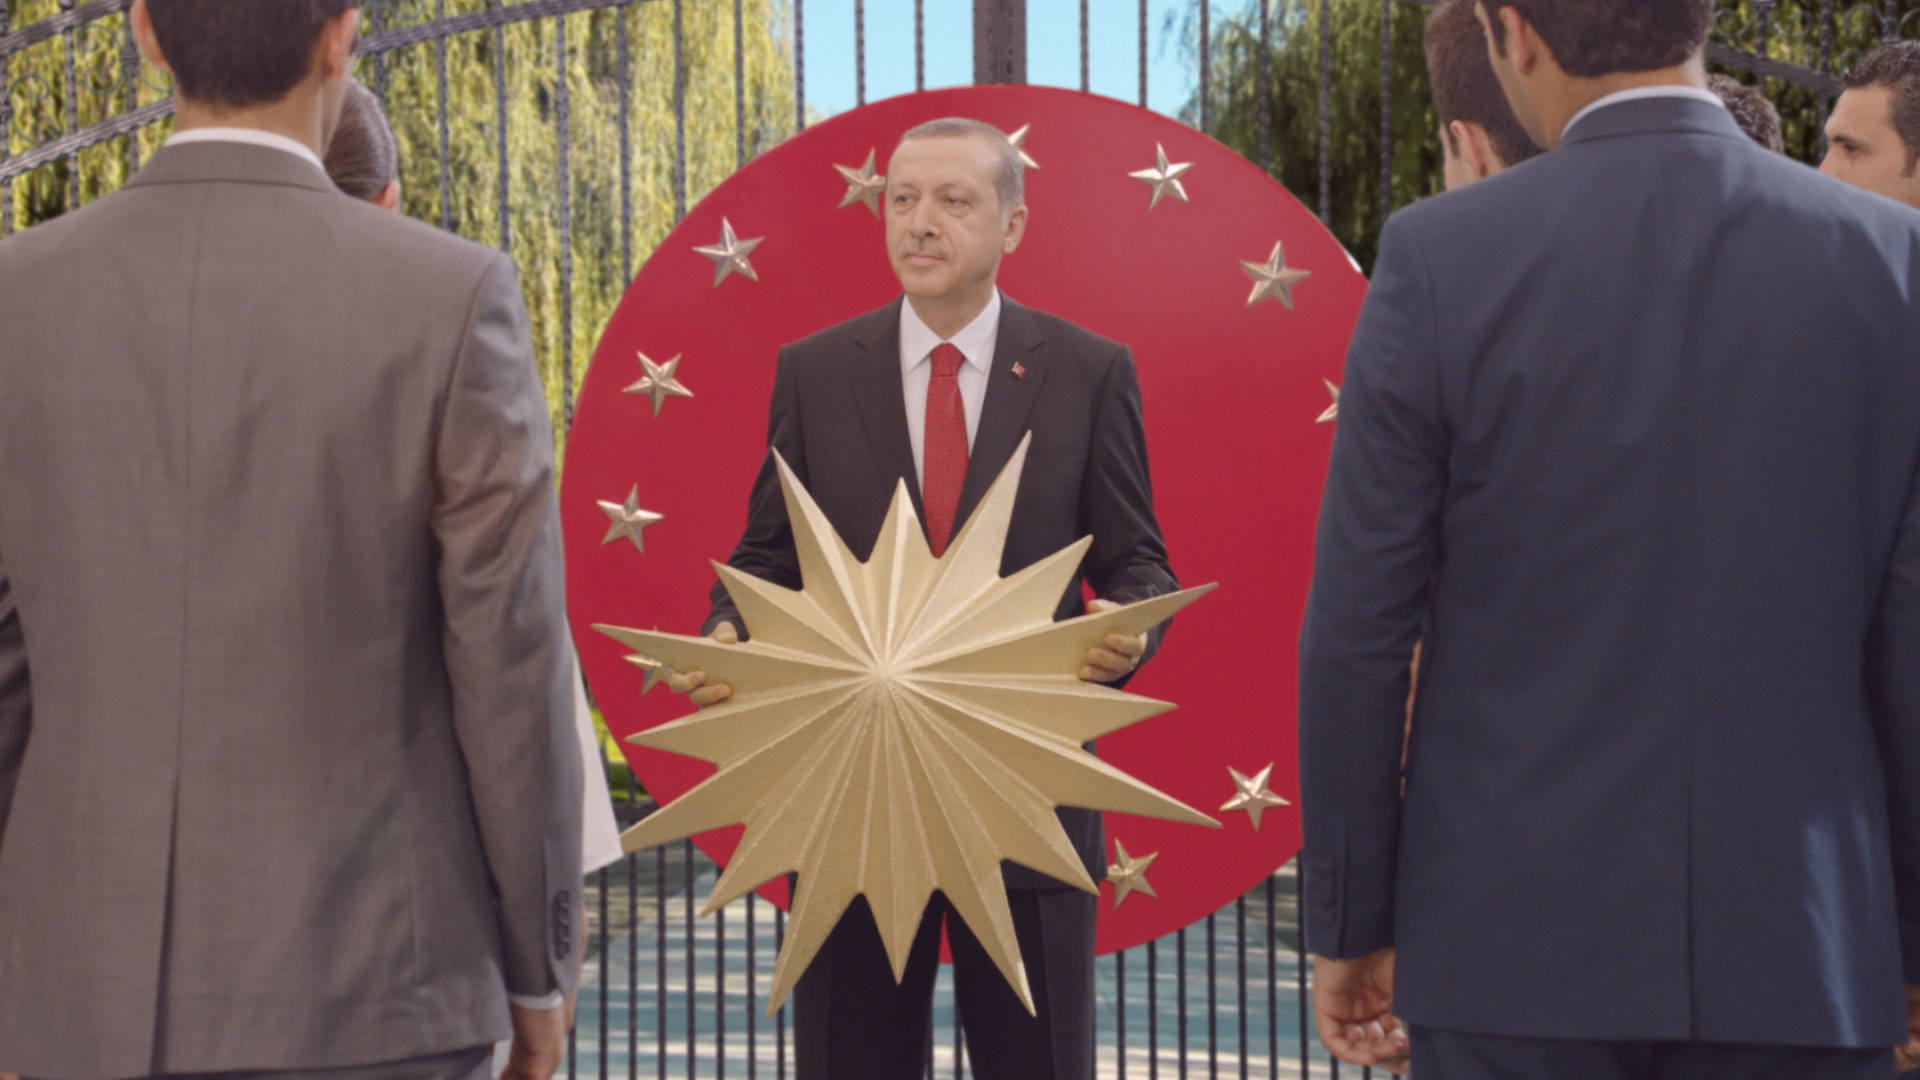 cumhurbaşkani-forsu-ve-recep-tayyip-erdoğan-reklam-filmi.jpg